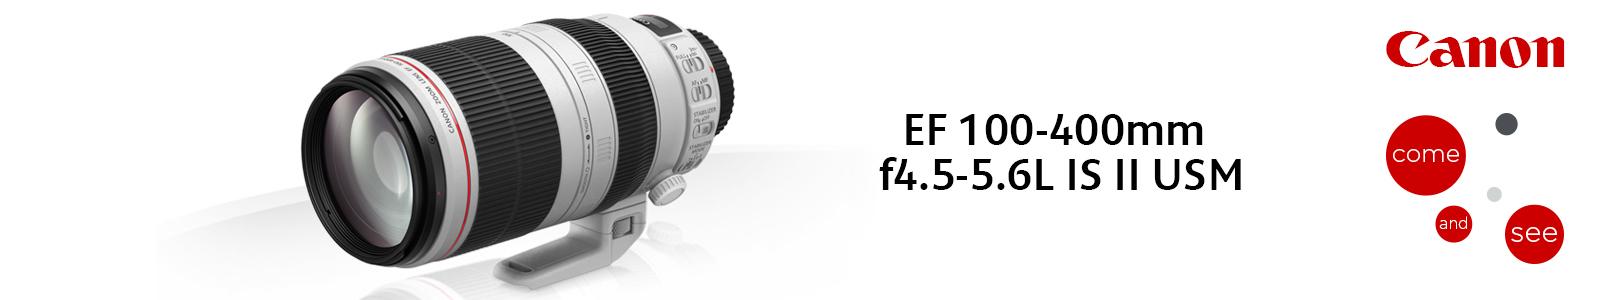 EF 100-400